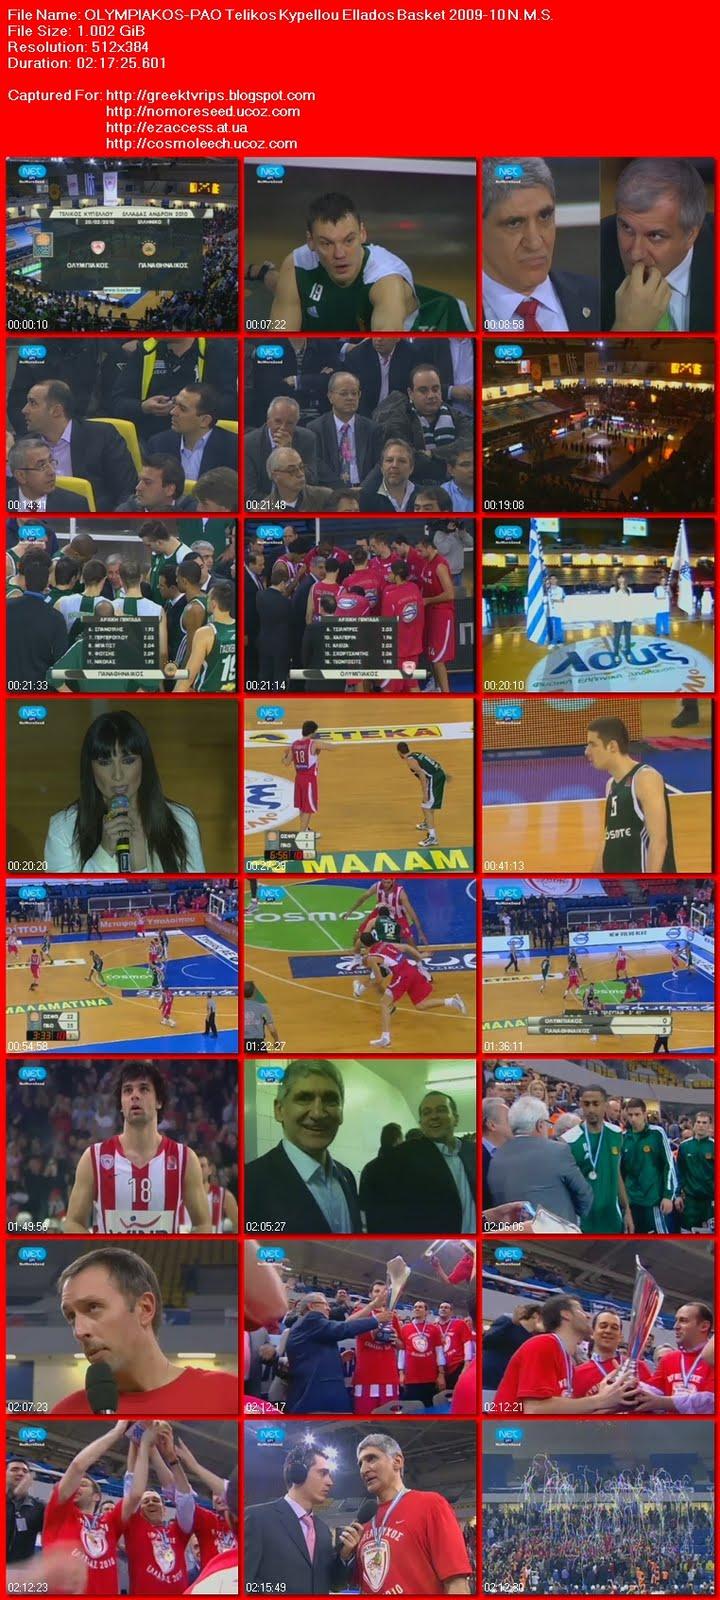 [OLYMPIAKOS-PAO+Telikos+Kypellou+Ellados+Basket+2009-10+N.M.S.jpg]